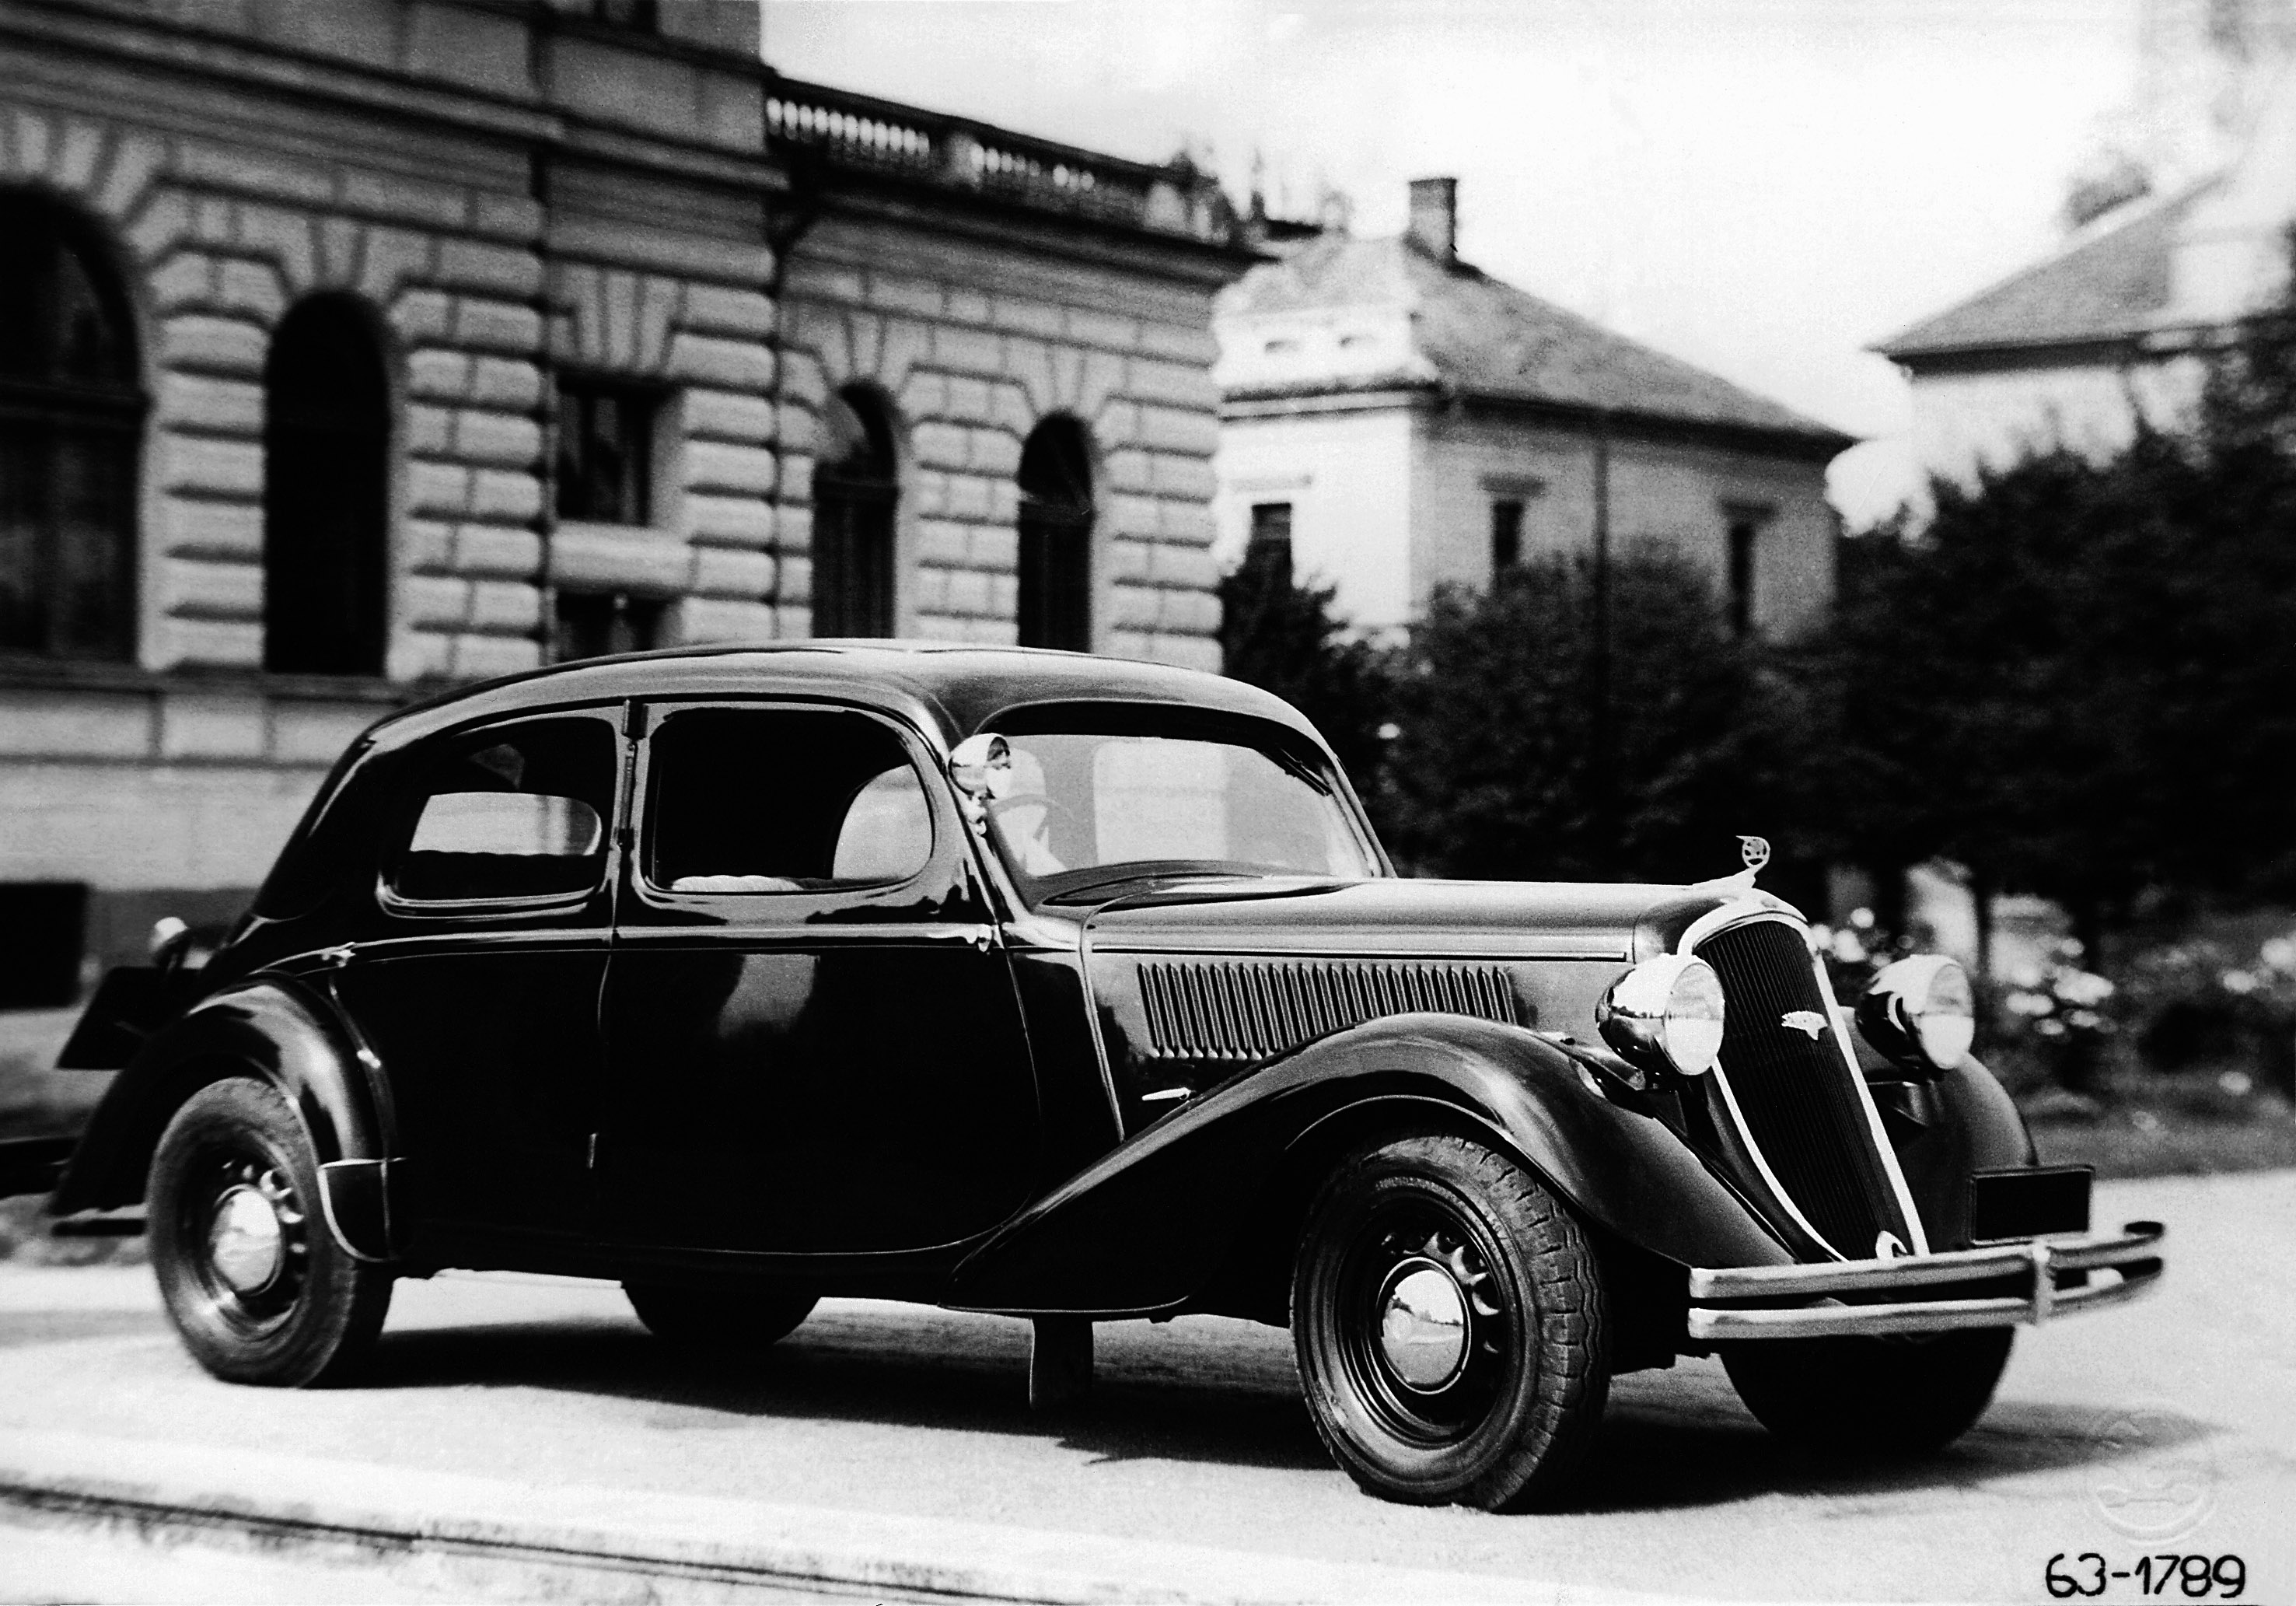 Skoda 1200 I 1952 - 1973 Sedan #3